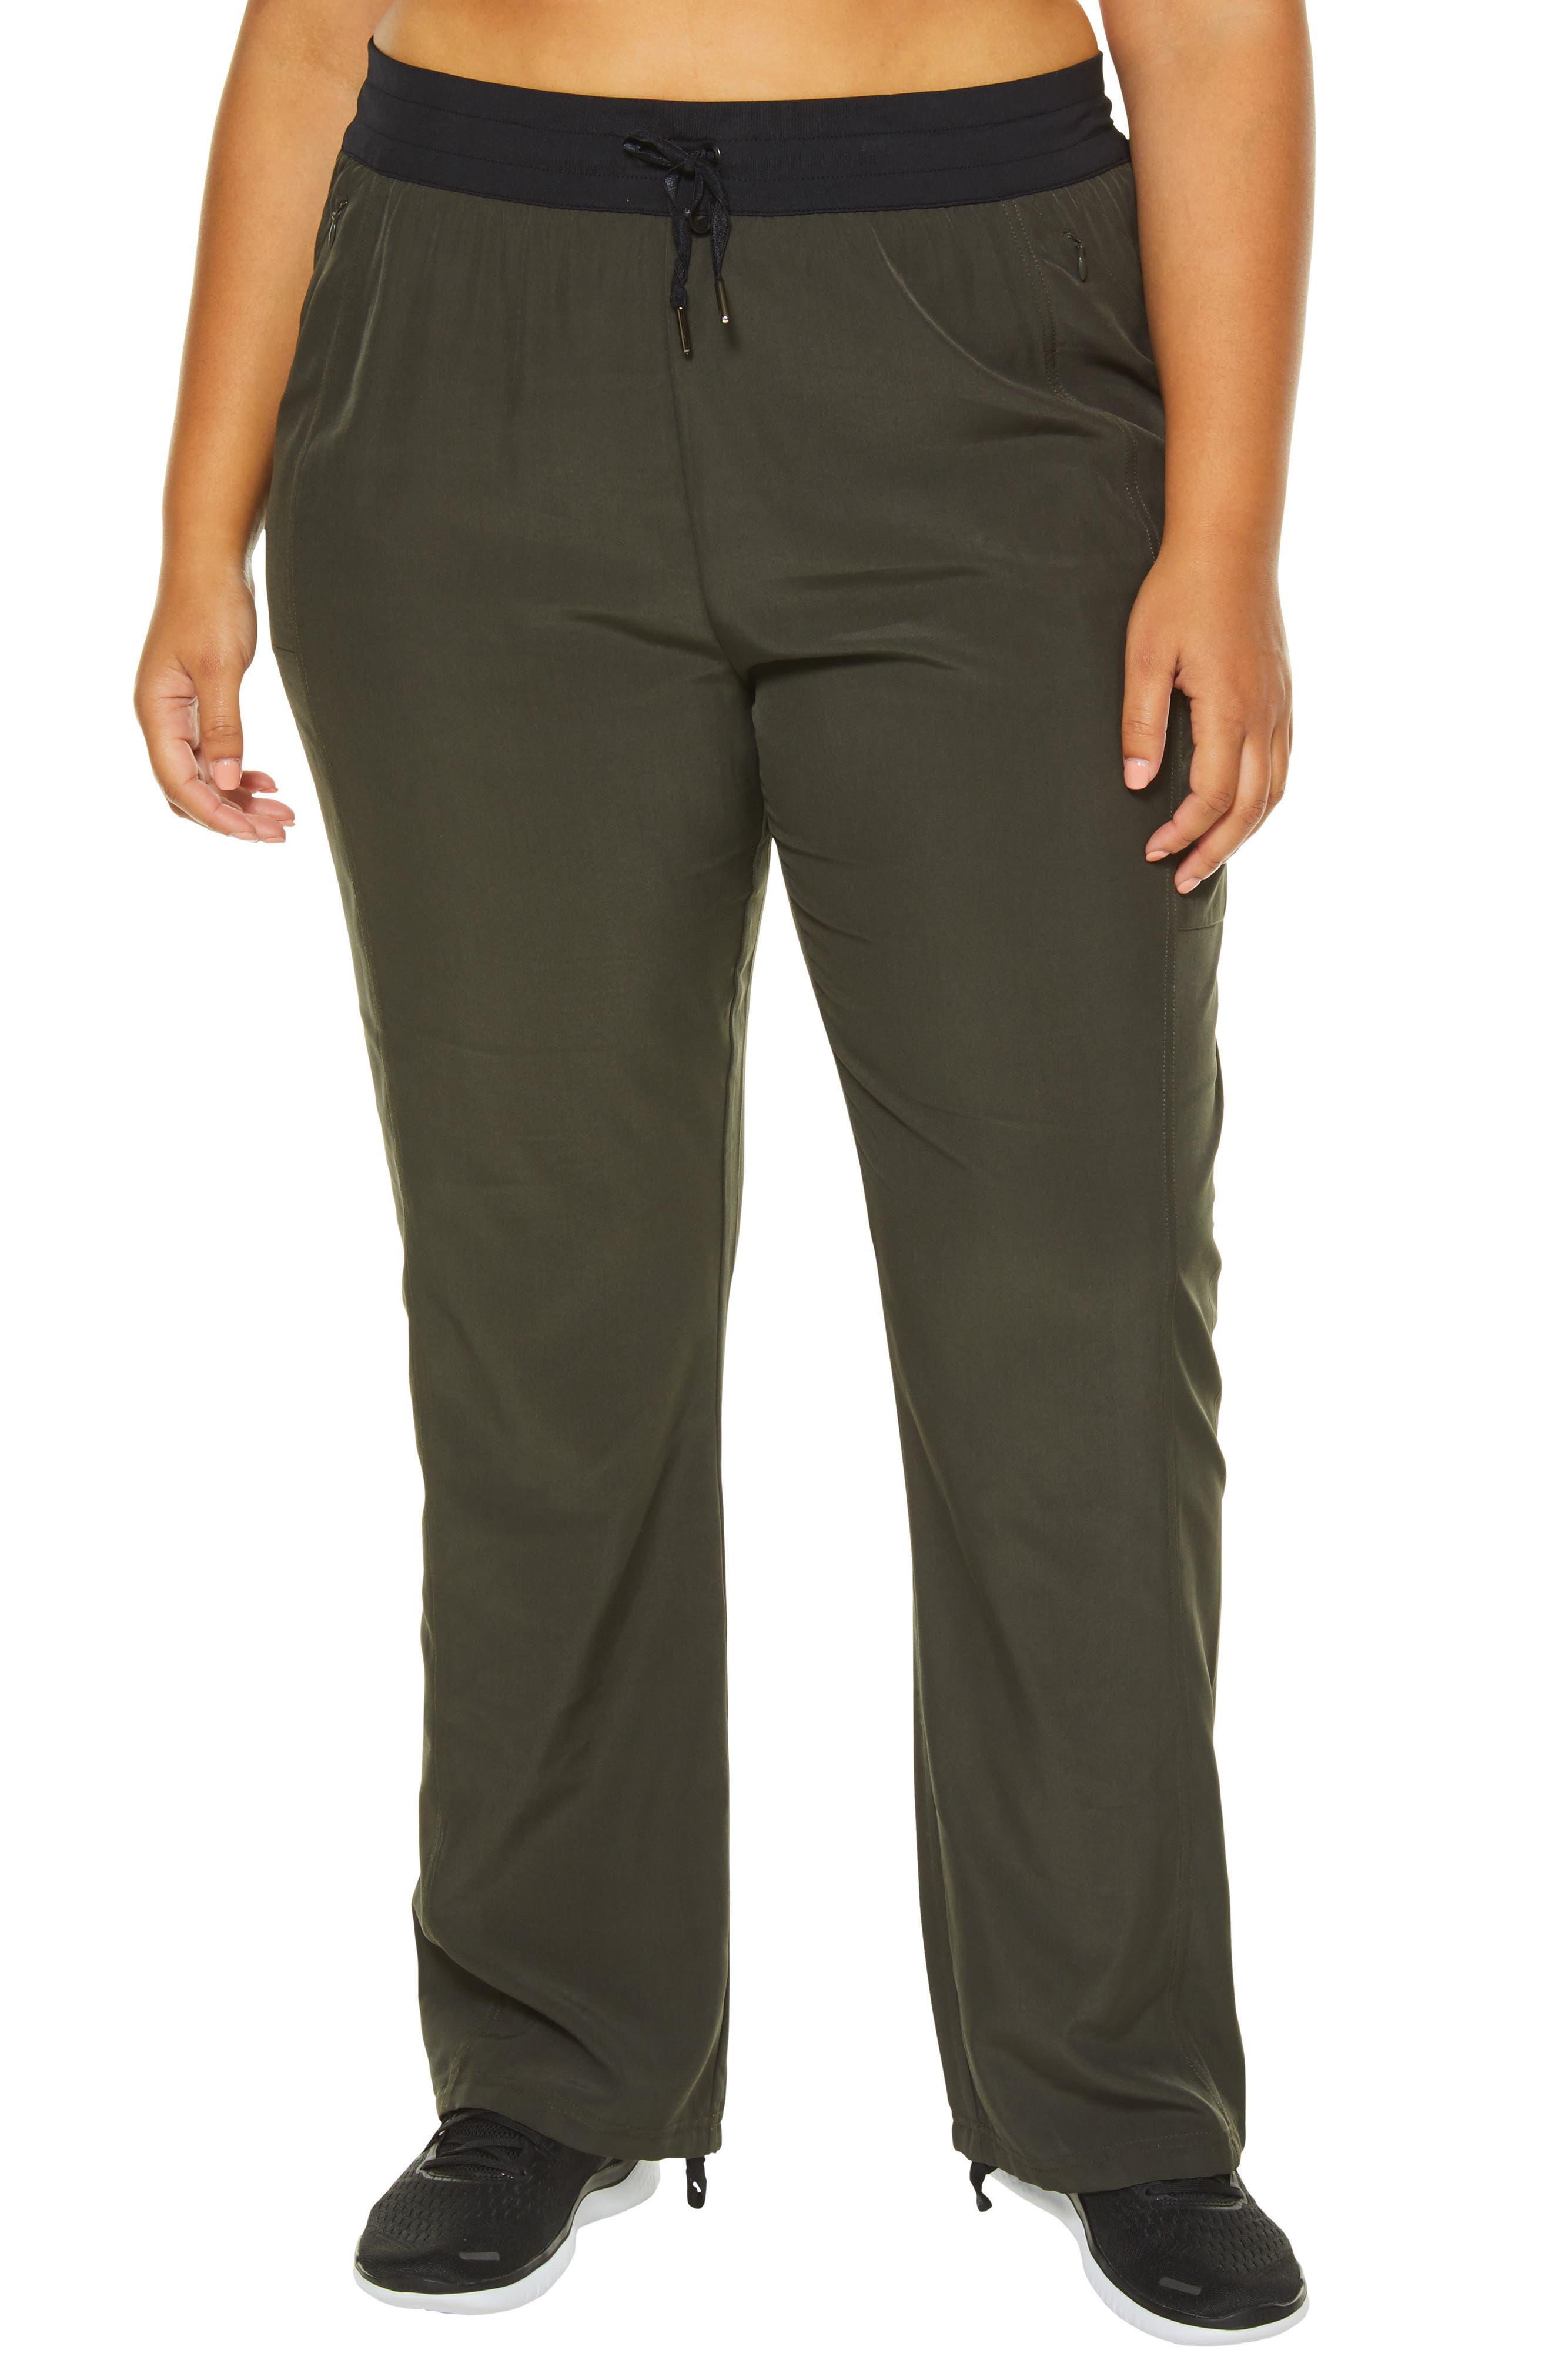 Plus Size Shape Activewear Jetset High Rise Pants, Green